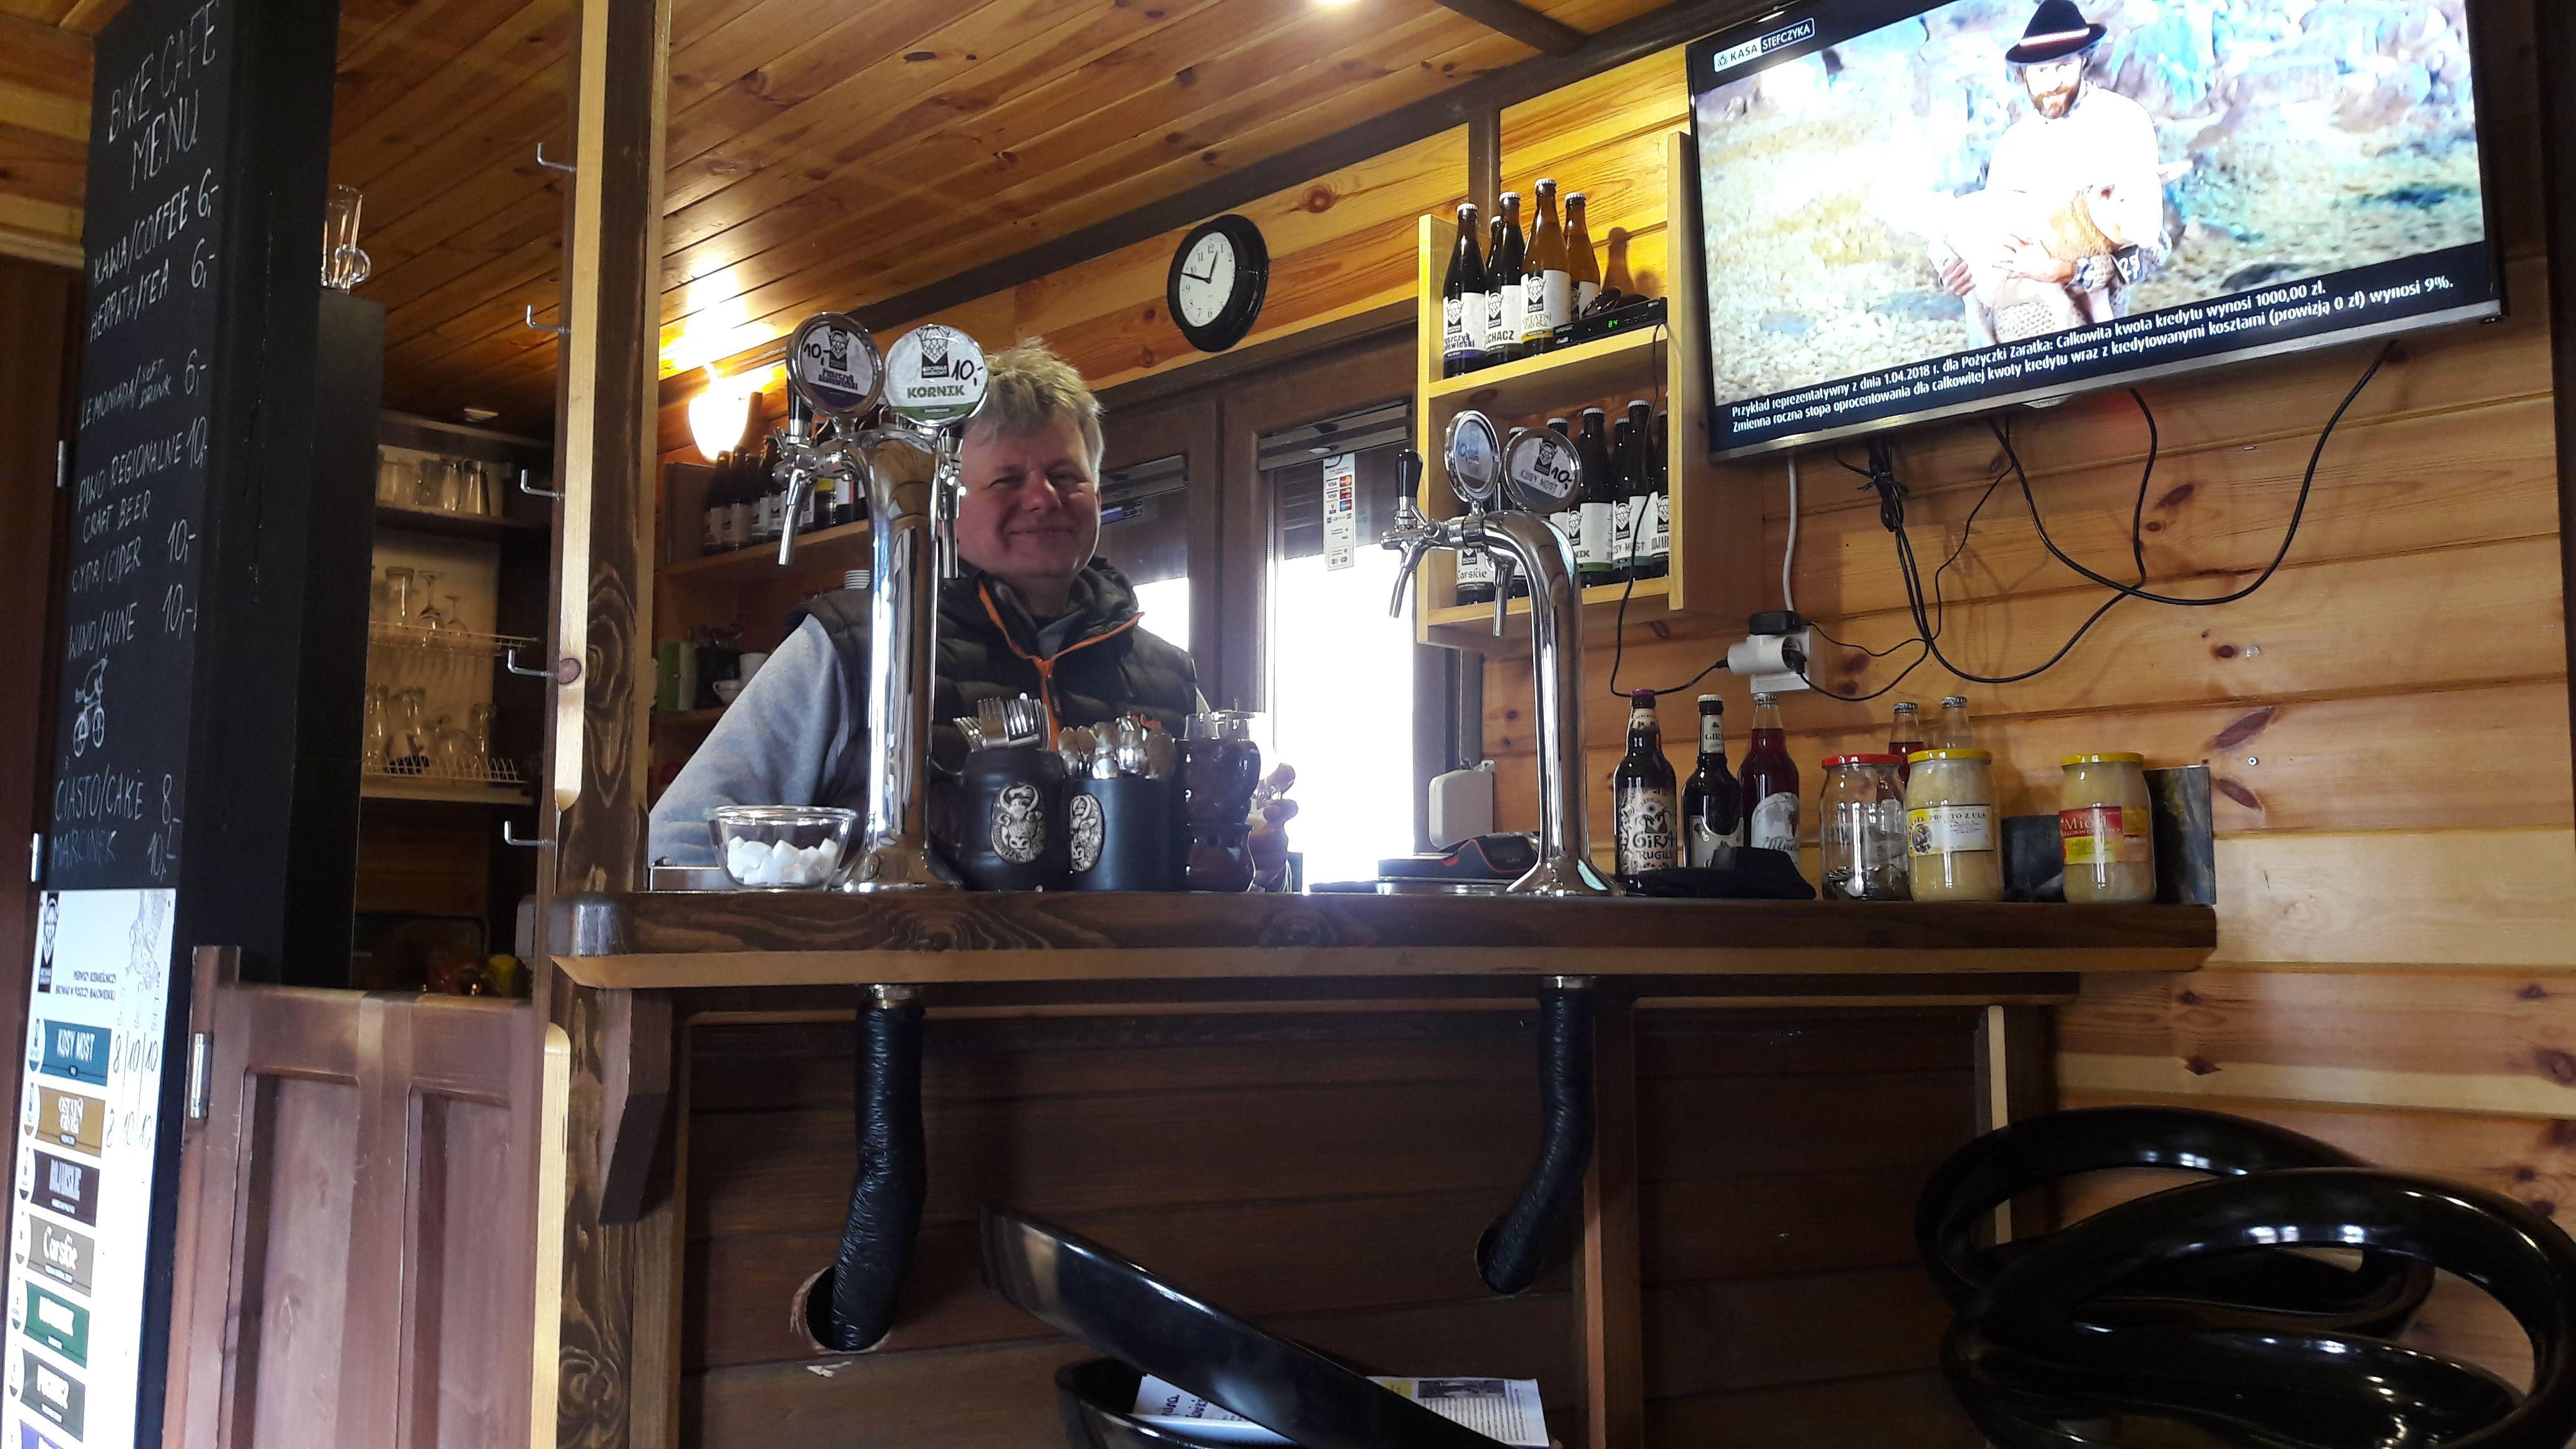 Slavomir, Kawa Bike Café, Bialowieza